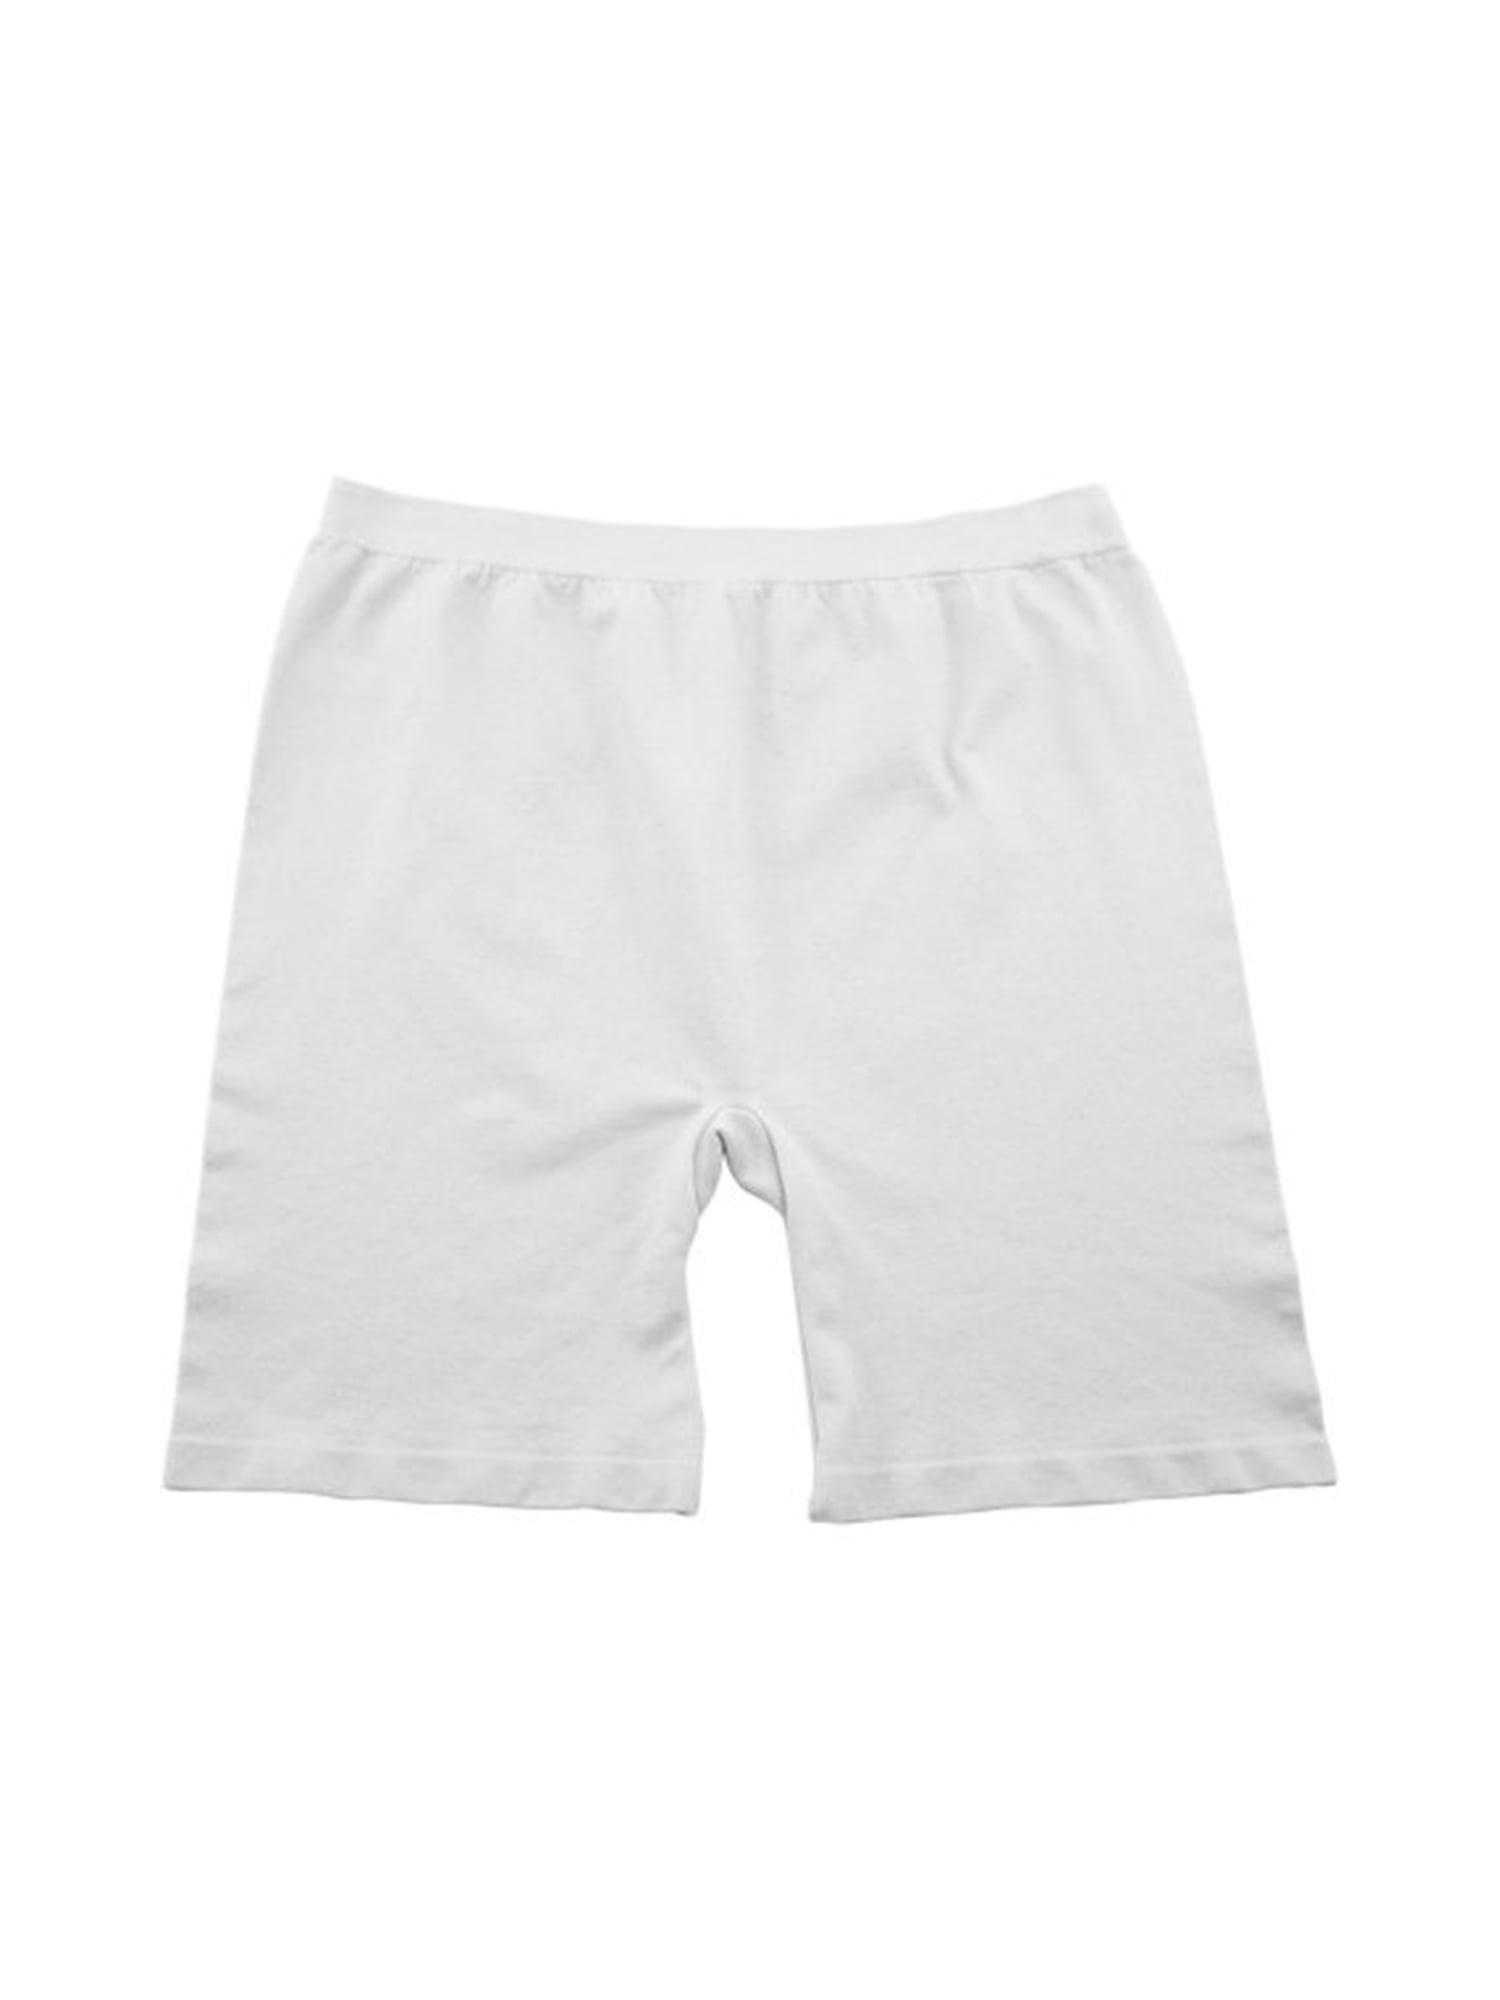 Girls Seamless Under-Skirt Short